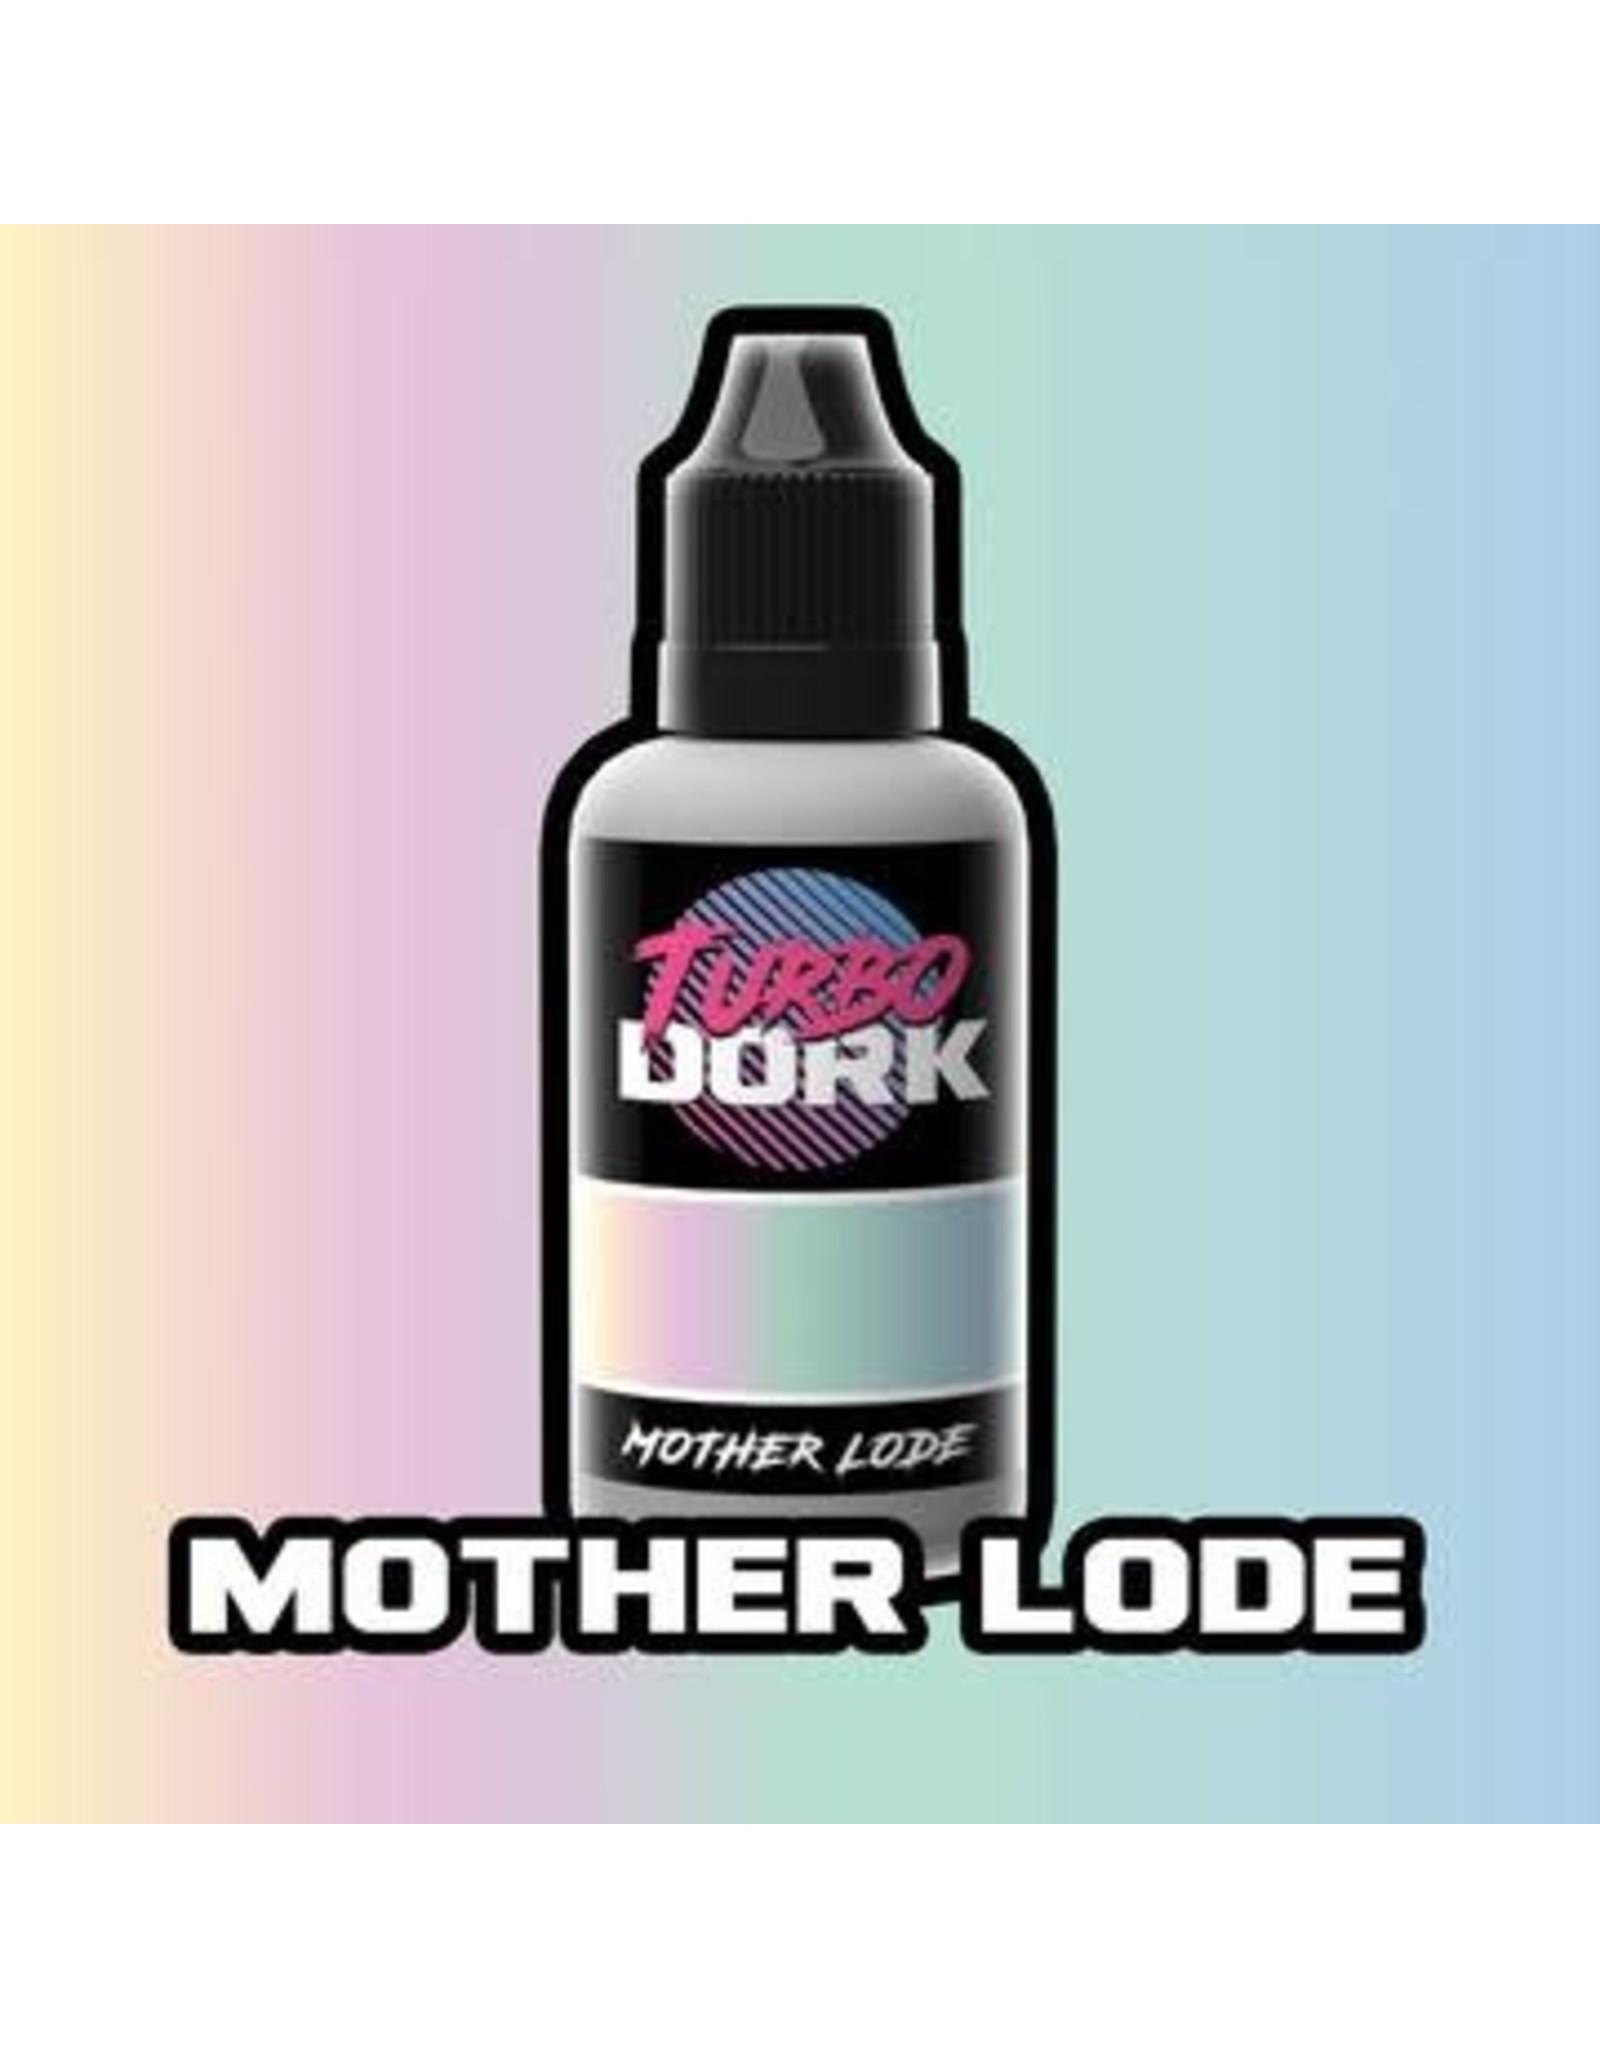 TurboDork TurboDork Paint: Turboshift Acrylic - 20ml - Mother Lode